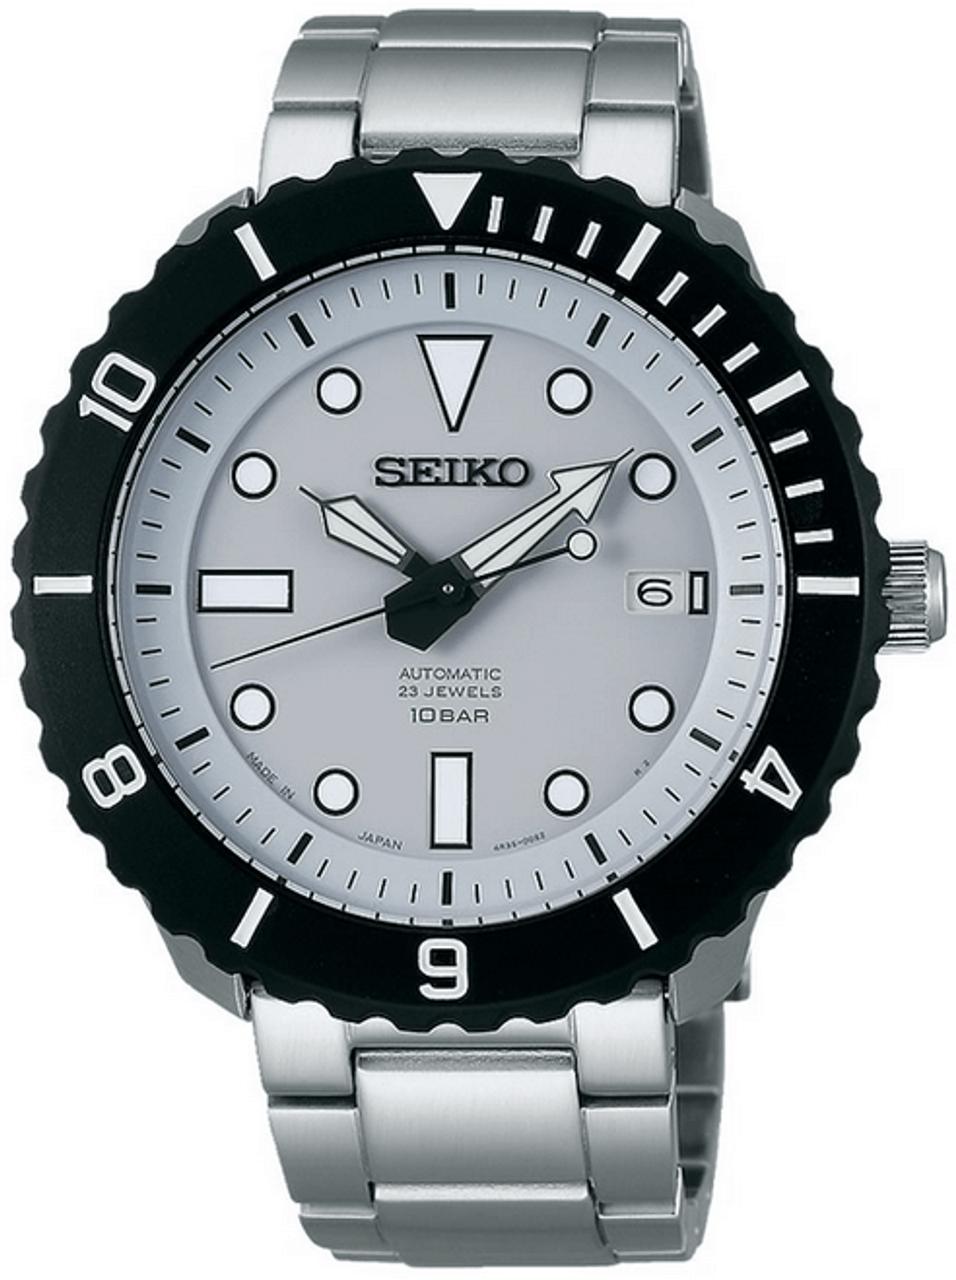 Seiko Nano Universe SCVE021 Limited